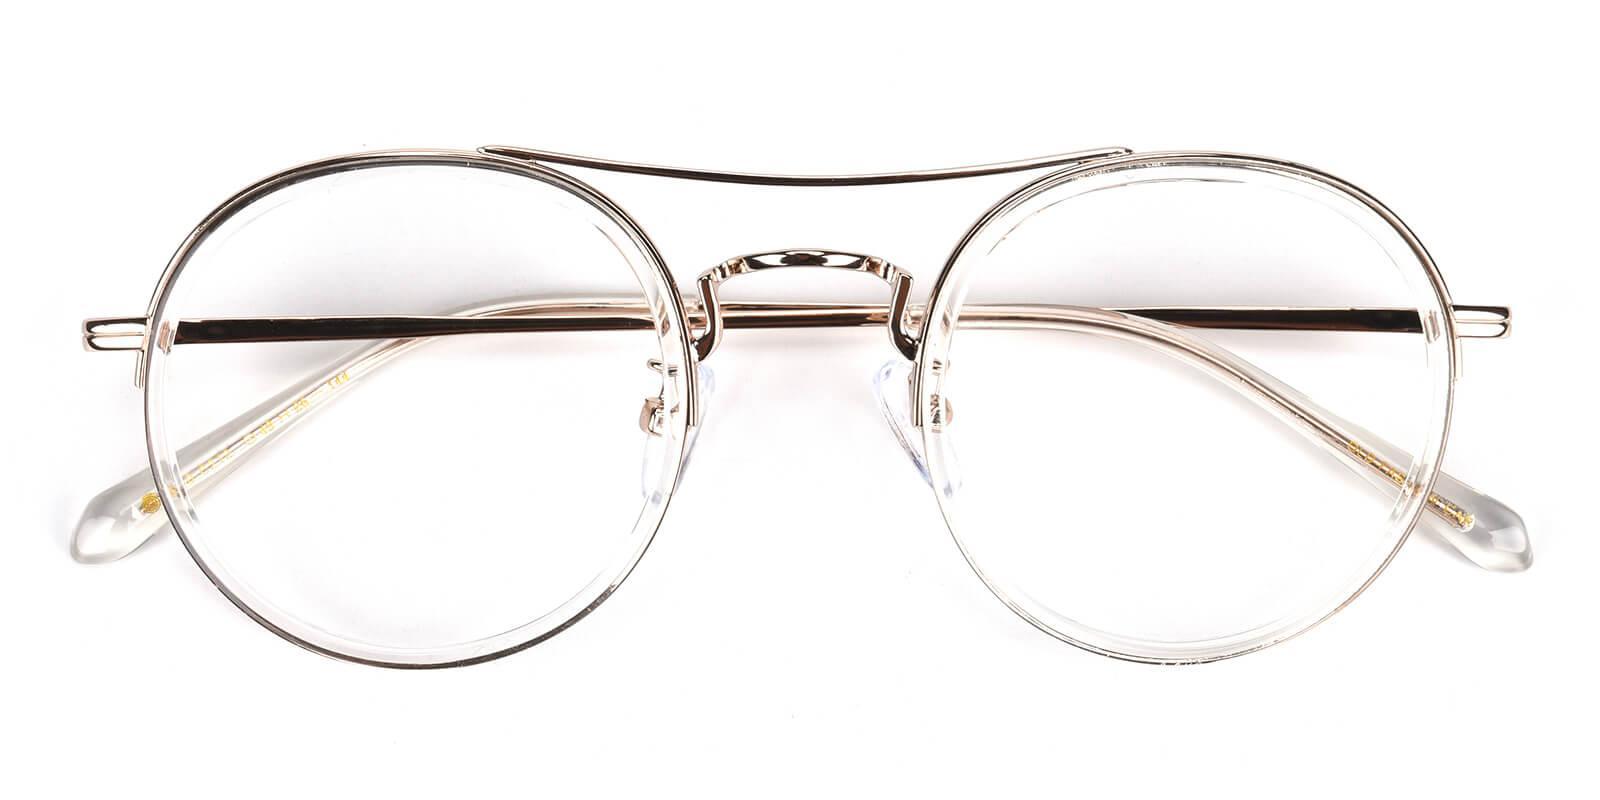 Teddy-Translucent-Aviator-Combination-Eyeglasses-detail